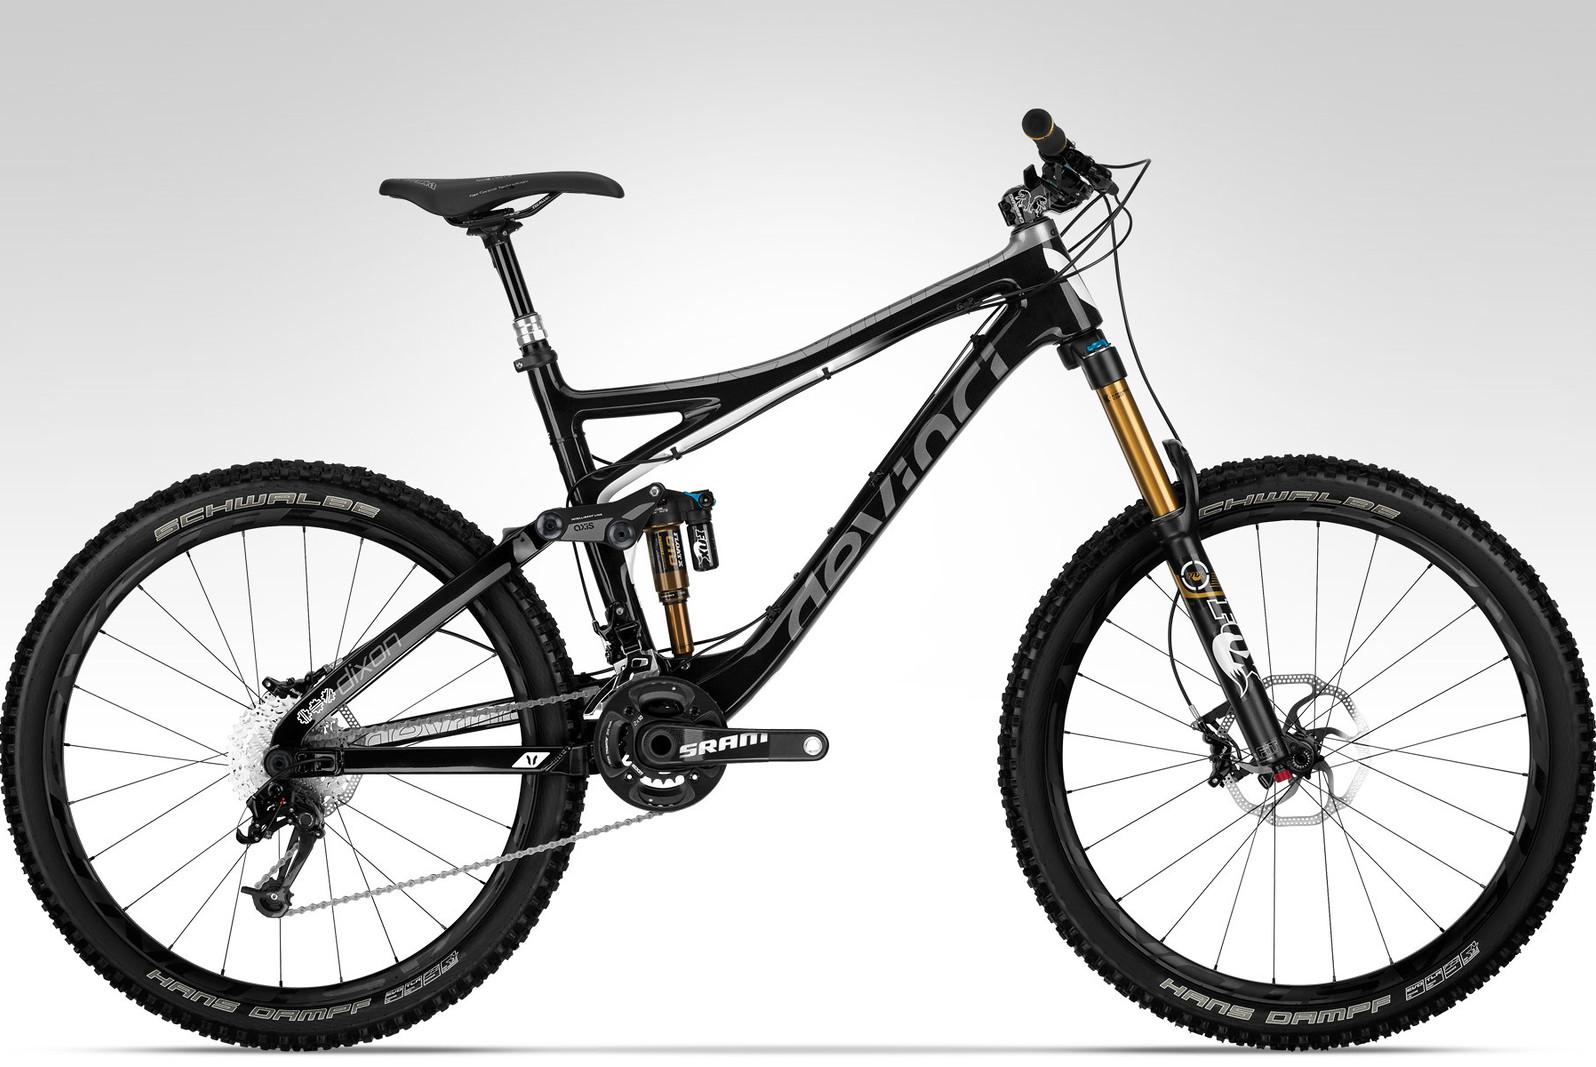 Devinci Dixon Carbon RR 2x10 bike